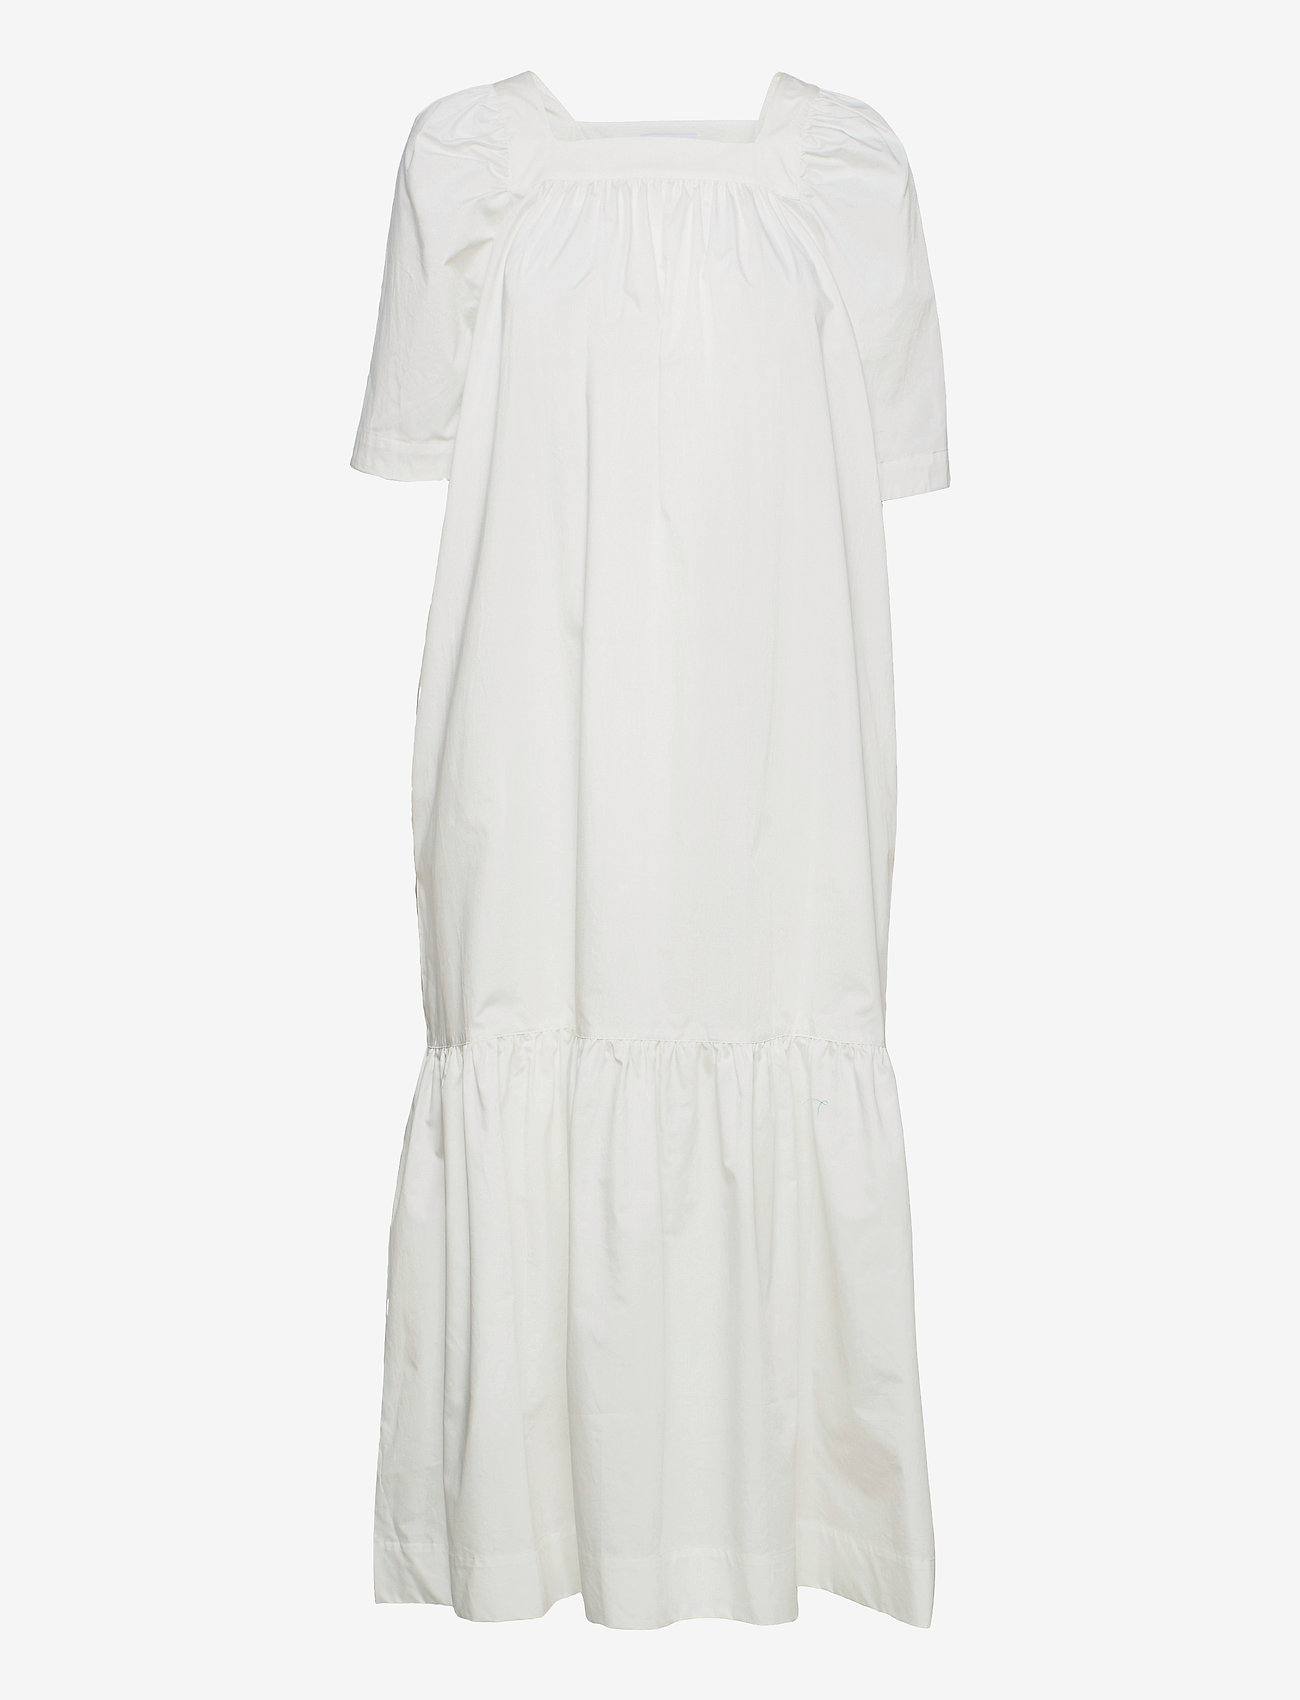 RODEBJER - RODEBJER DONYA - maxi dresses - white - 0